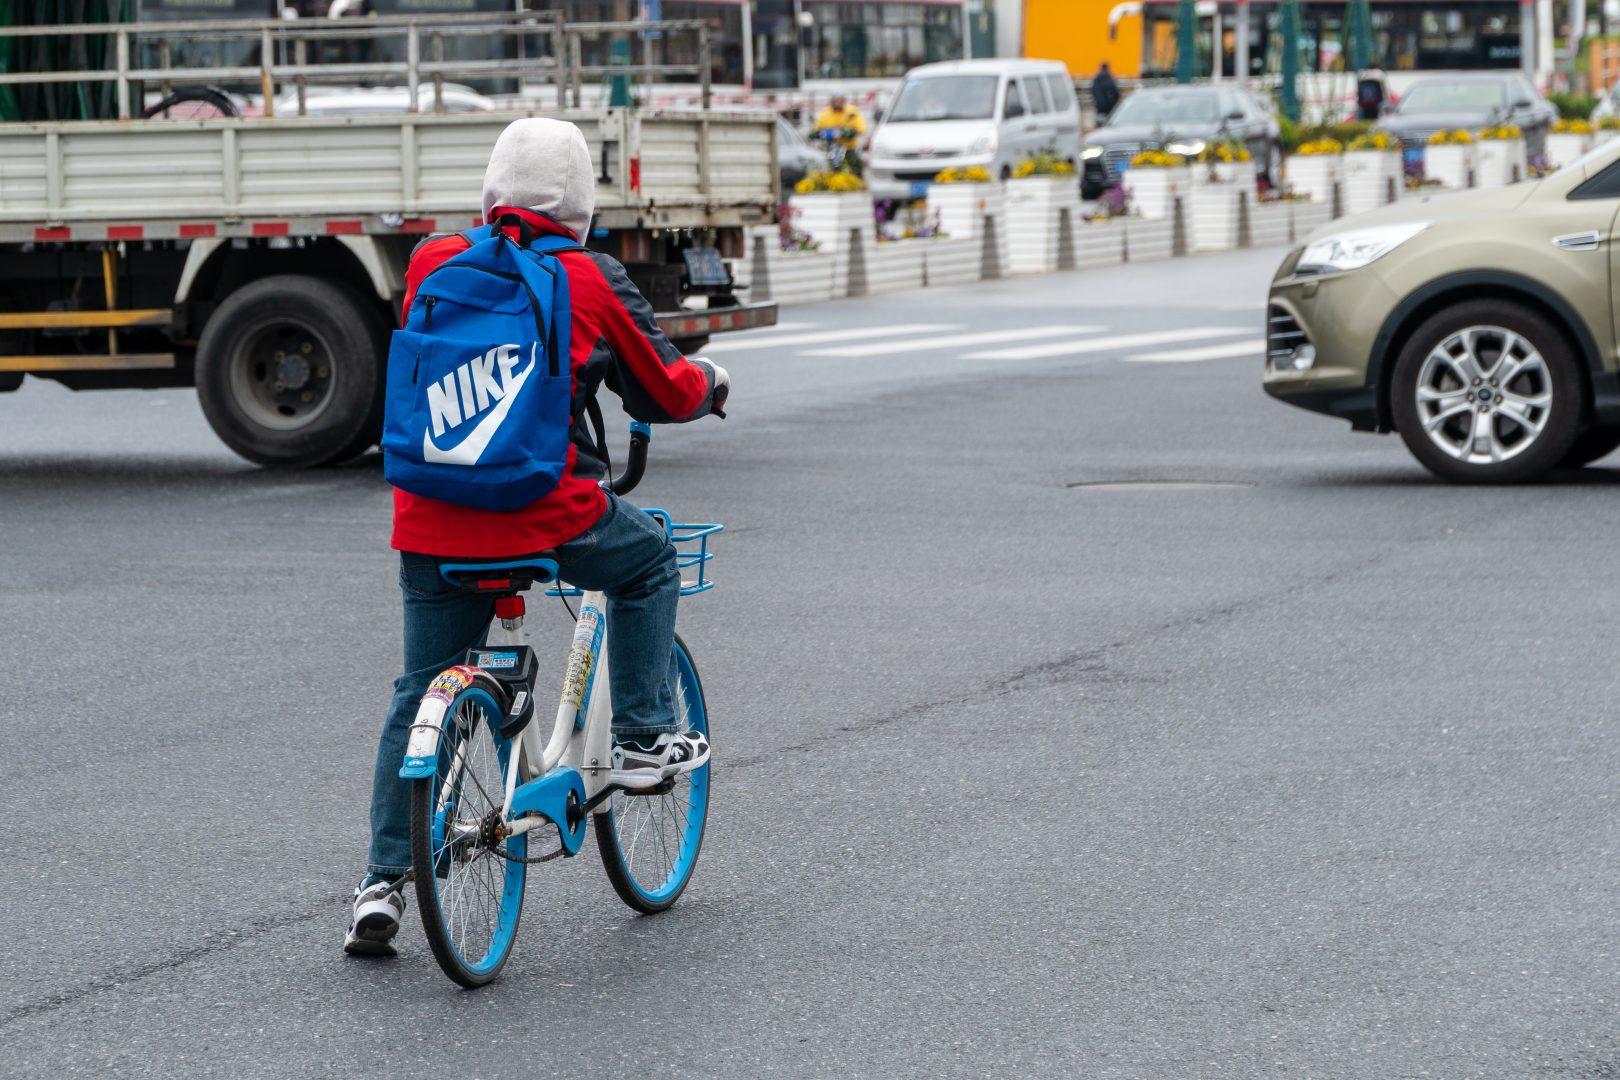 Bike rental firm Hello Global exceeds 300 million users · TechNode